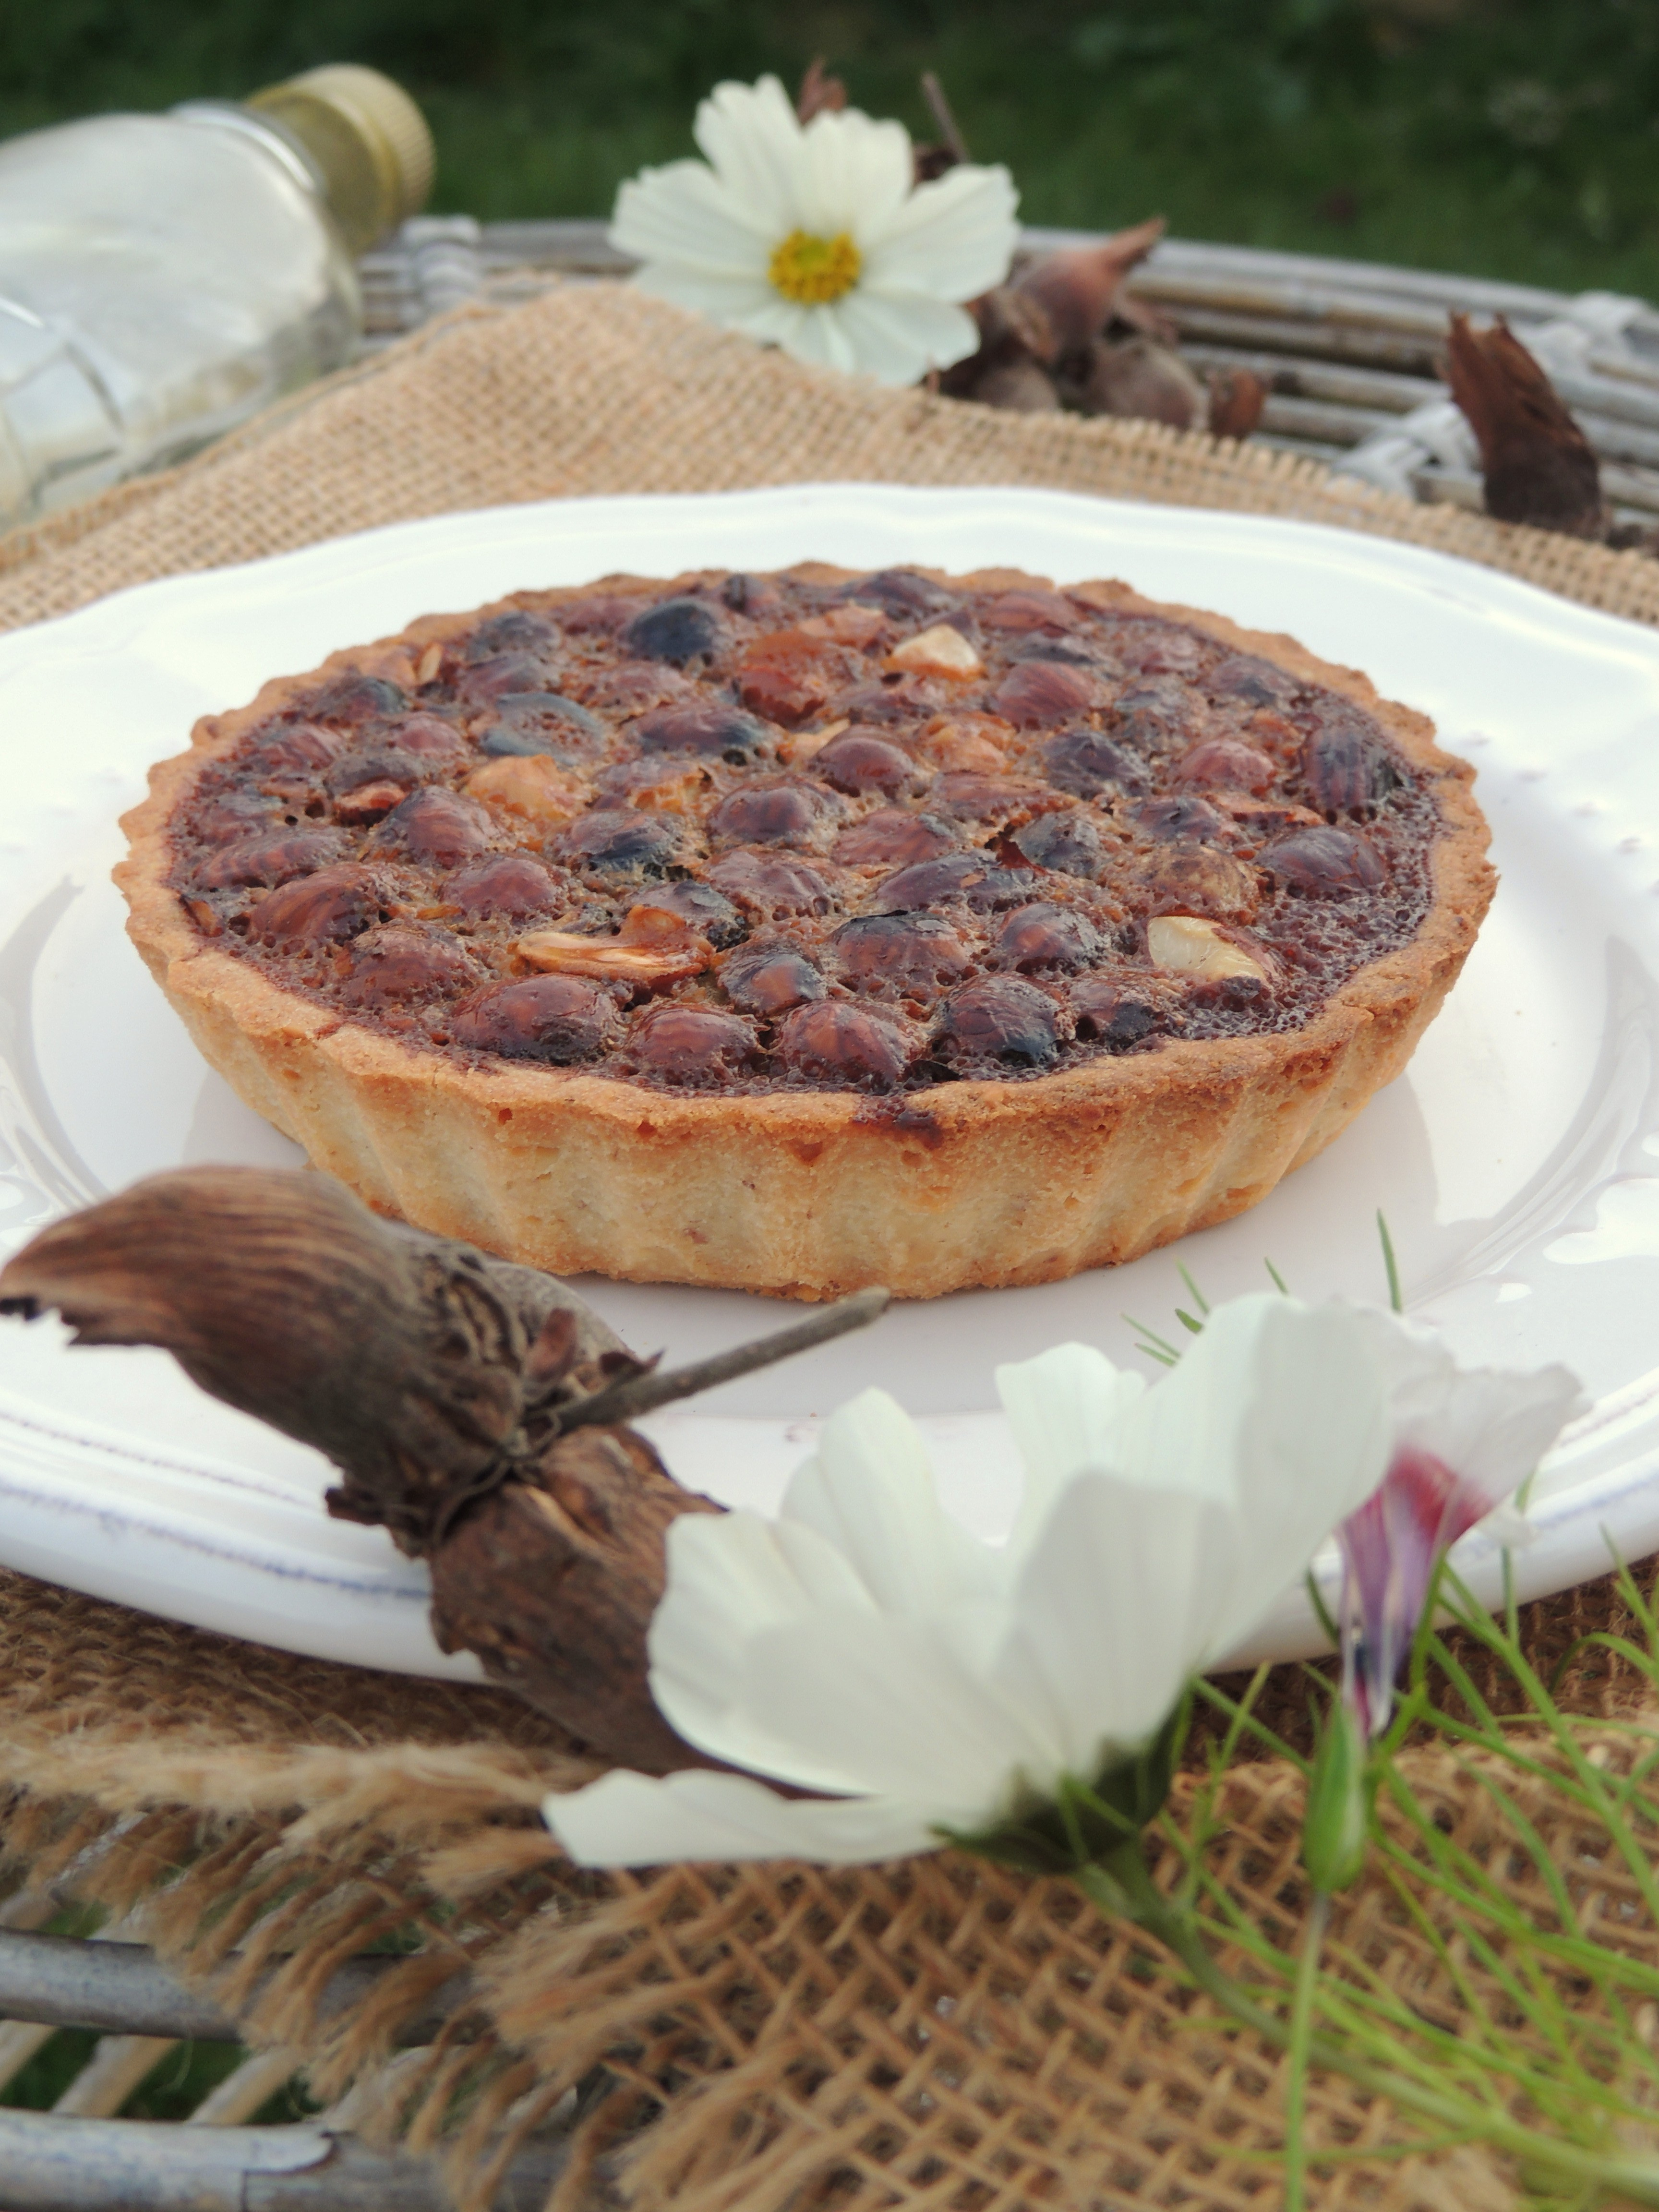 Tartelettes noisette caramel au sirop d'érable – Hazelnut & maple caramel pies